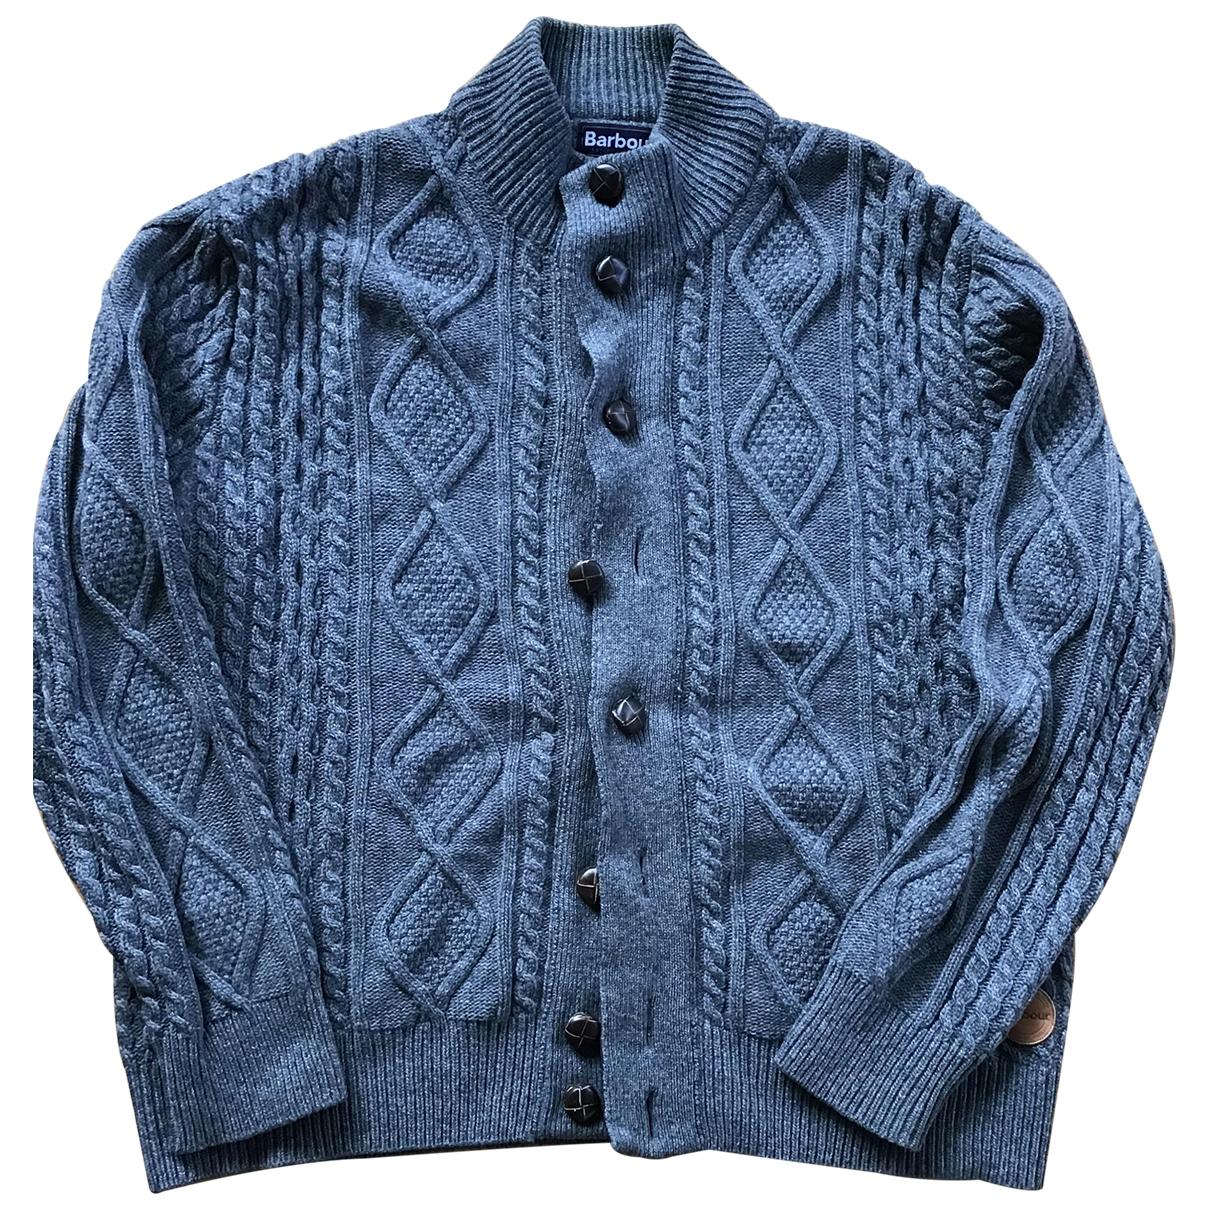 Barbour \N Grey Wool jacket  for Men XL International